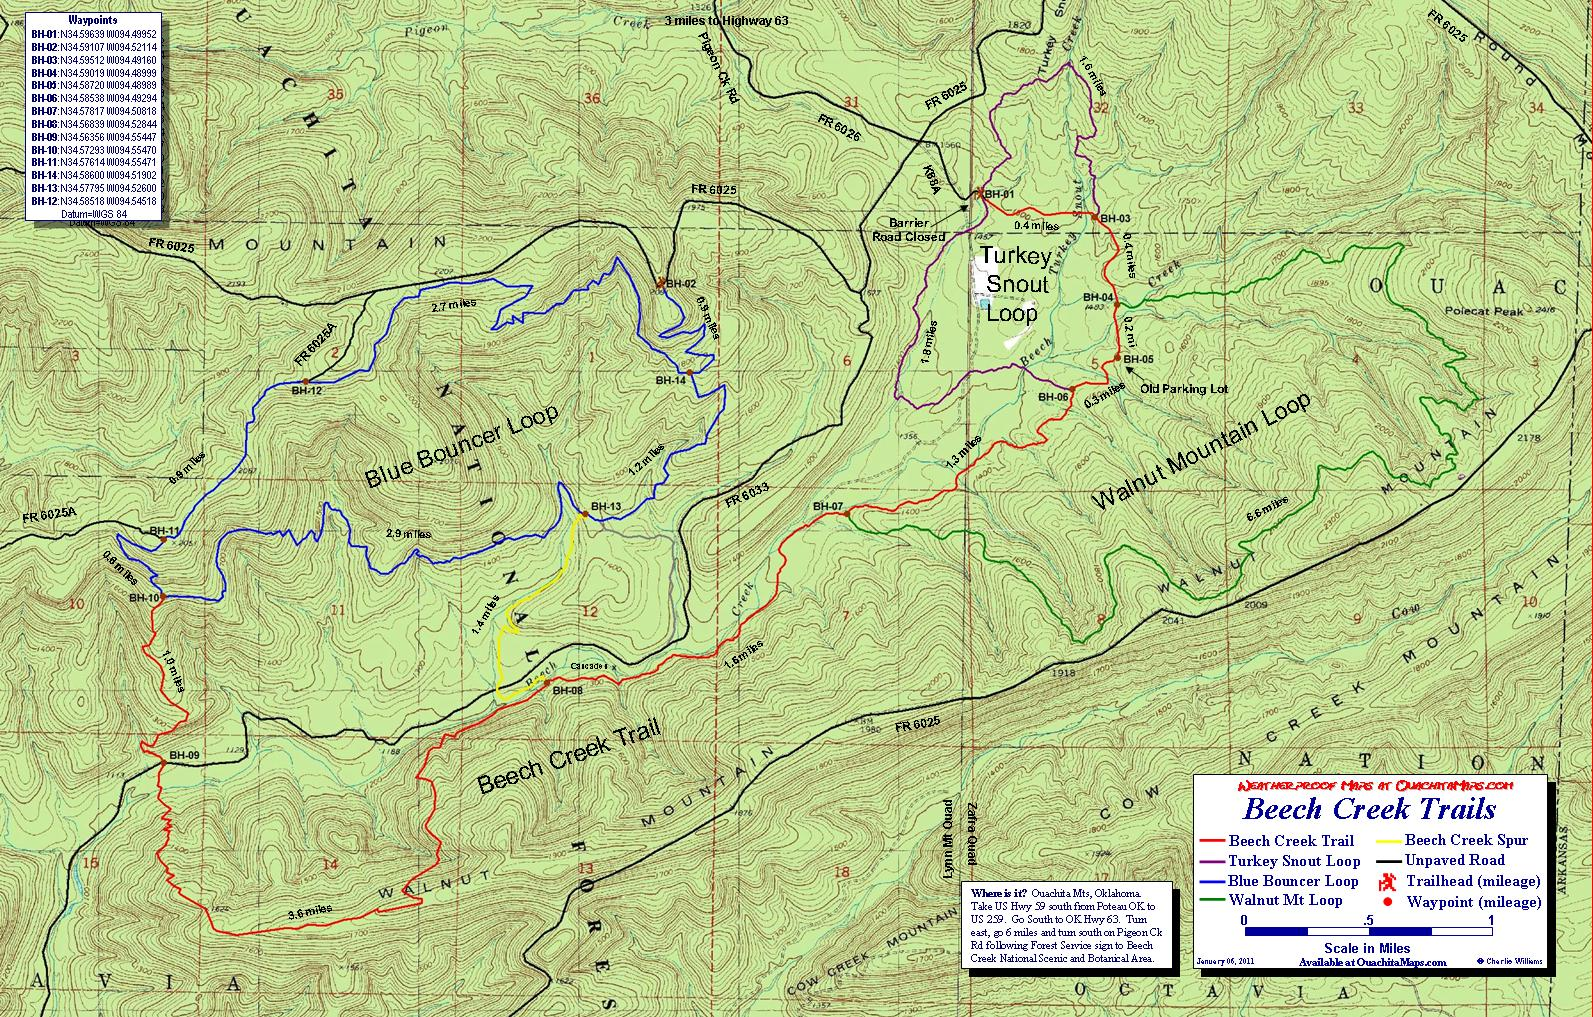 Mountains In Oklahoma Map.Beech Creek Trails Map Ouachita Mts Oklahoma